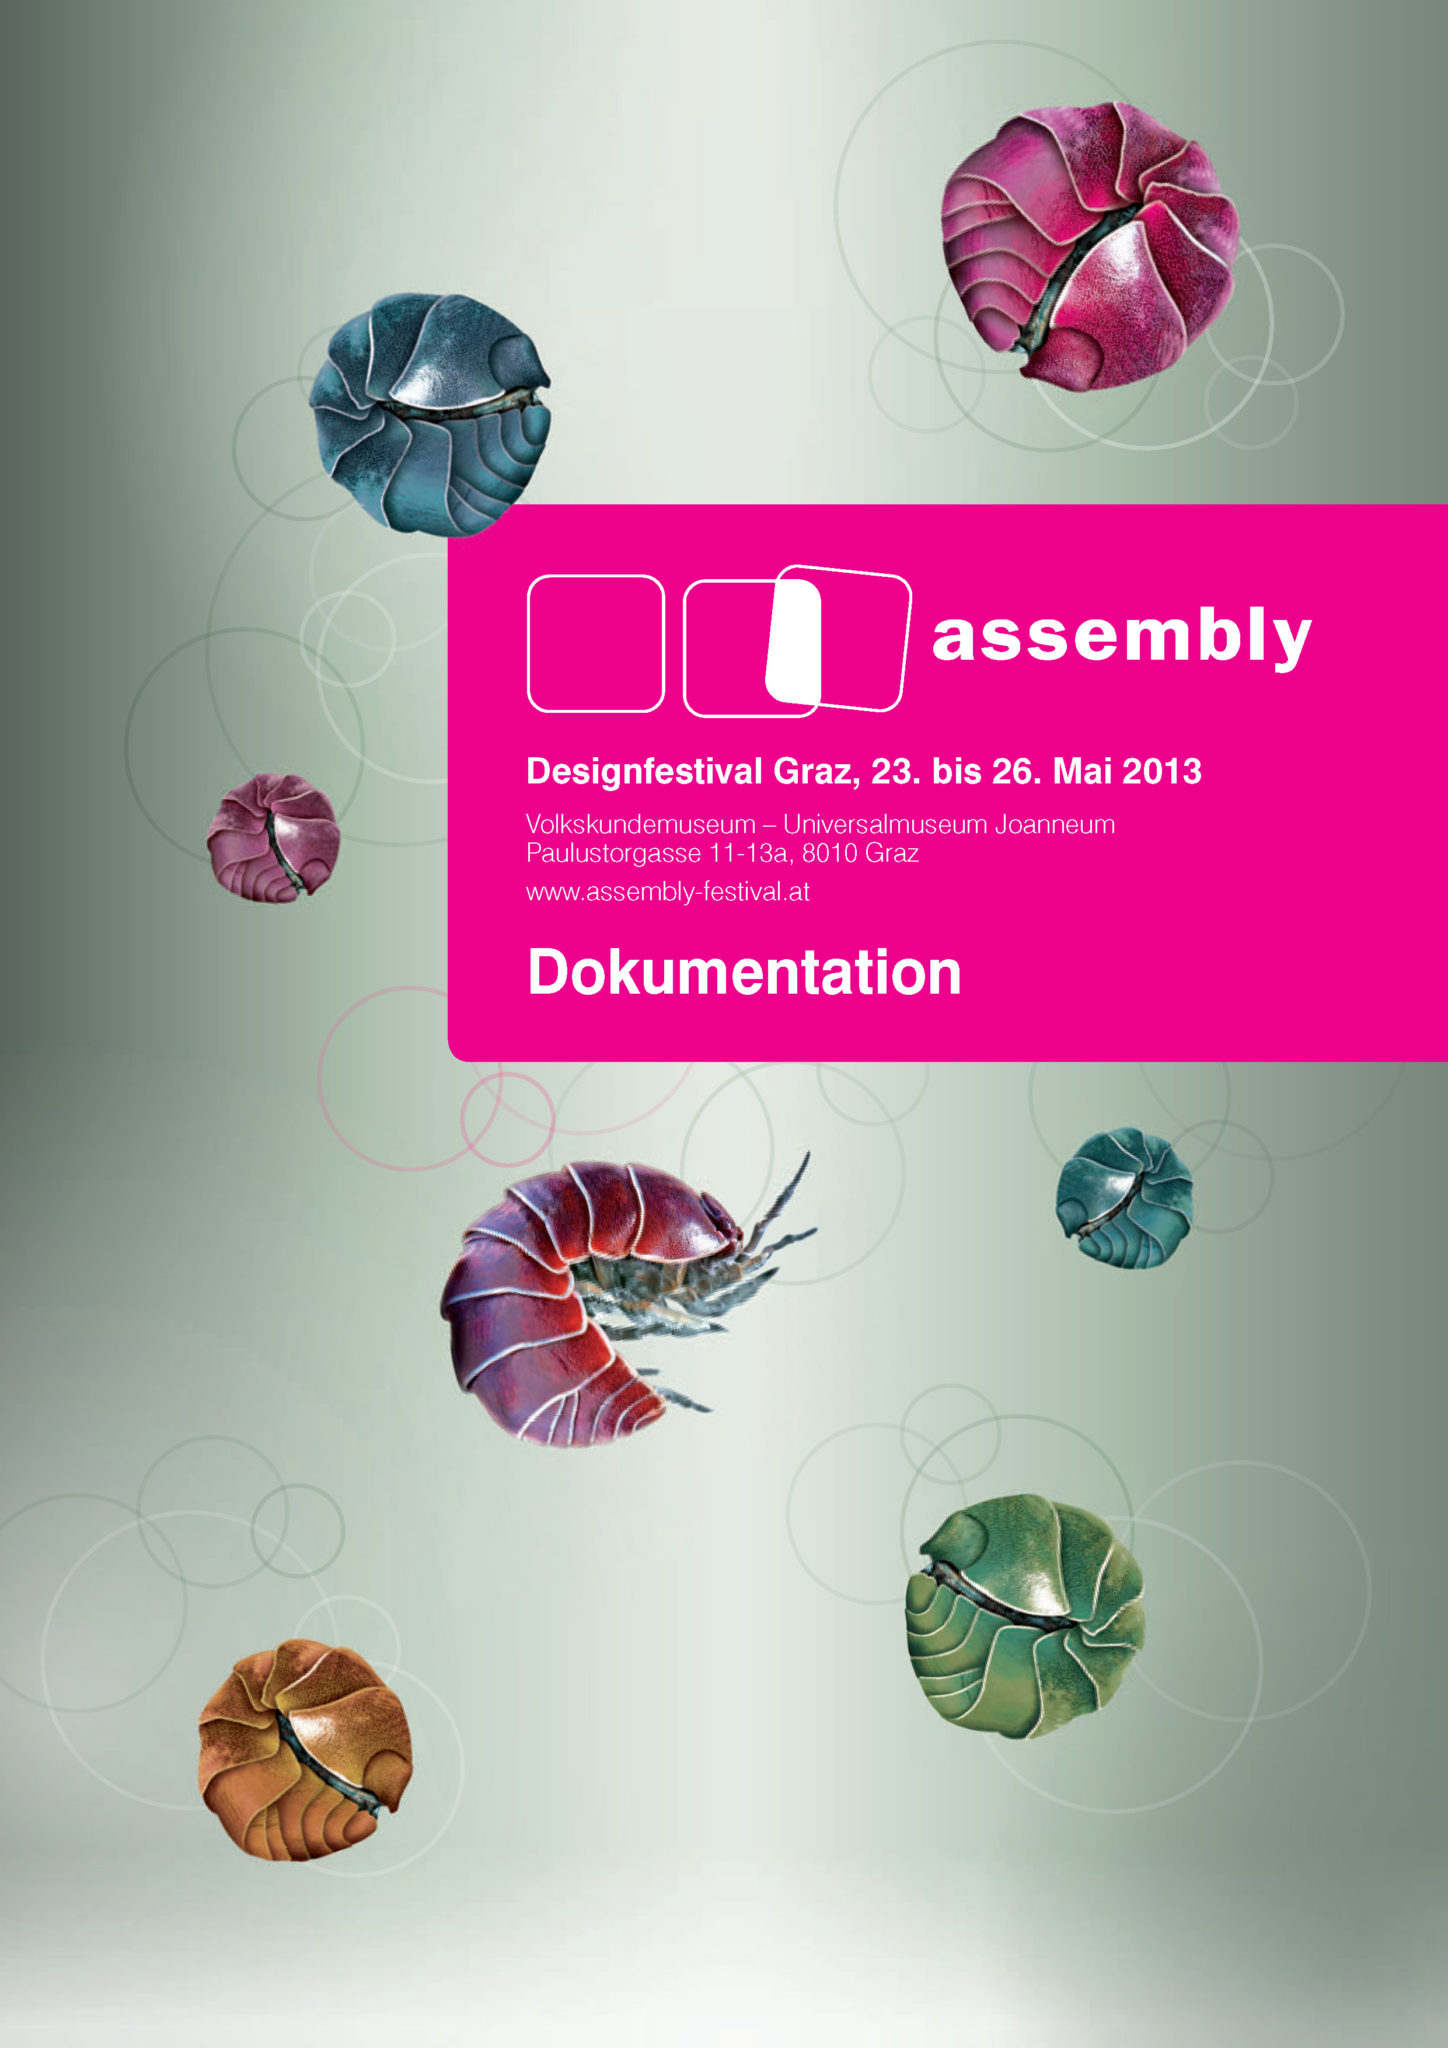 assembly Festival Archive 2013